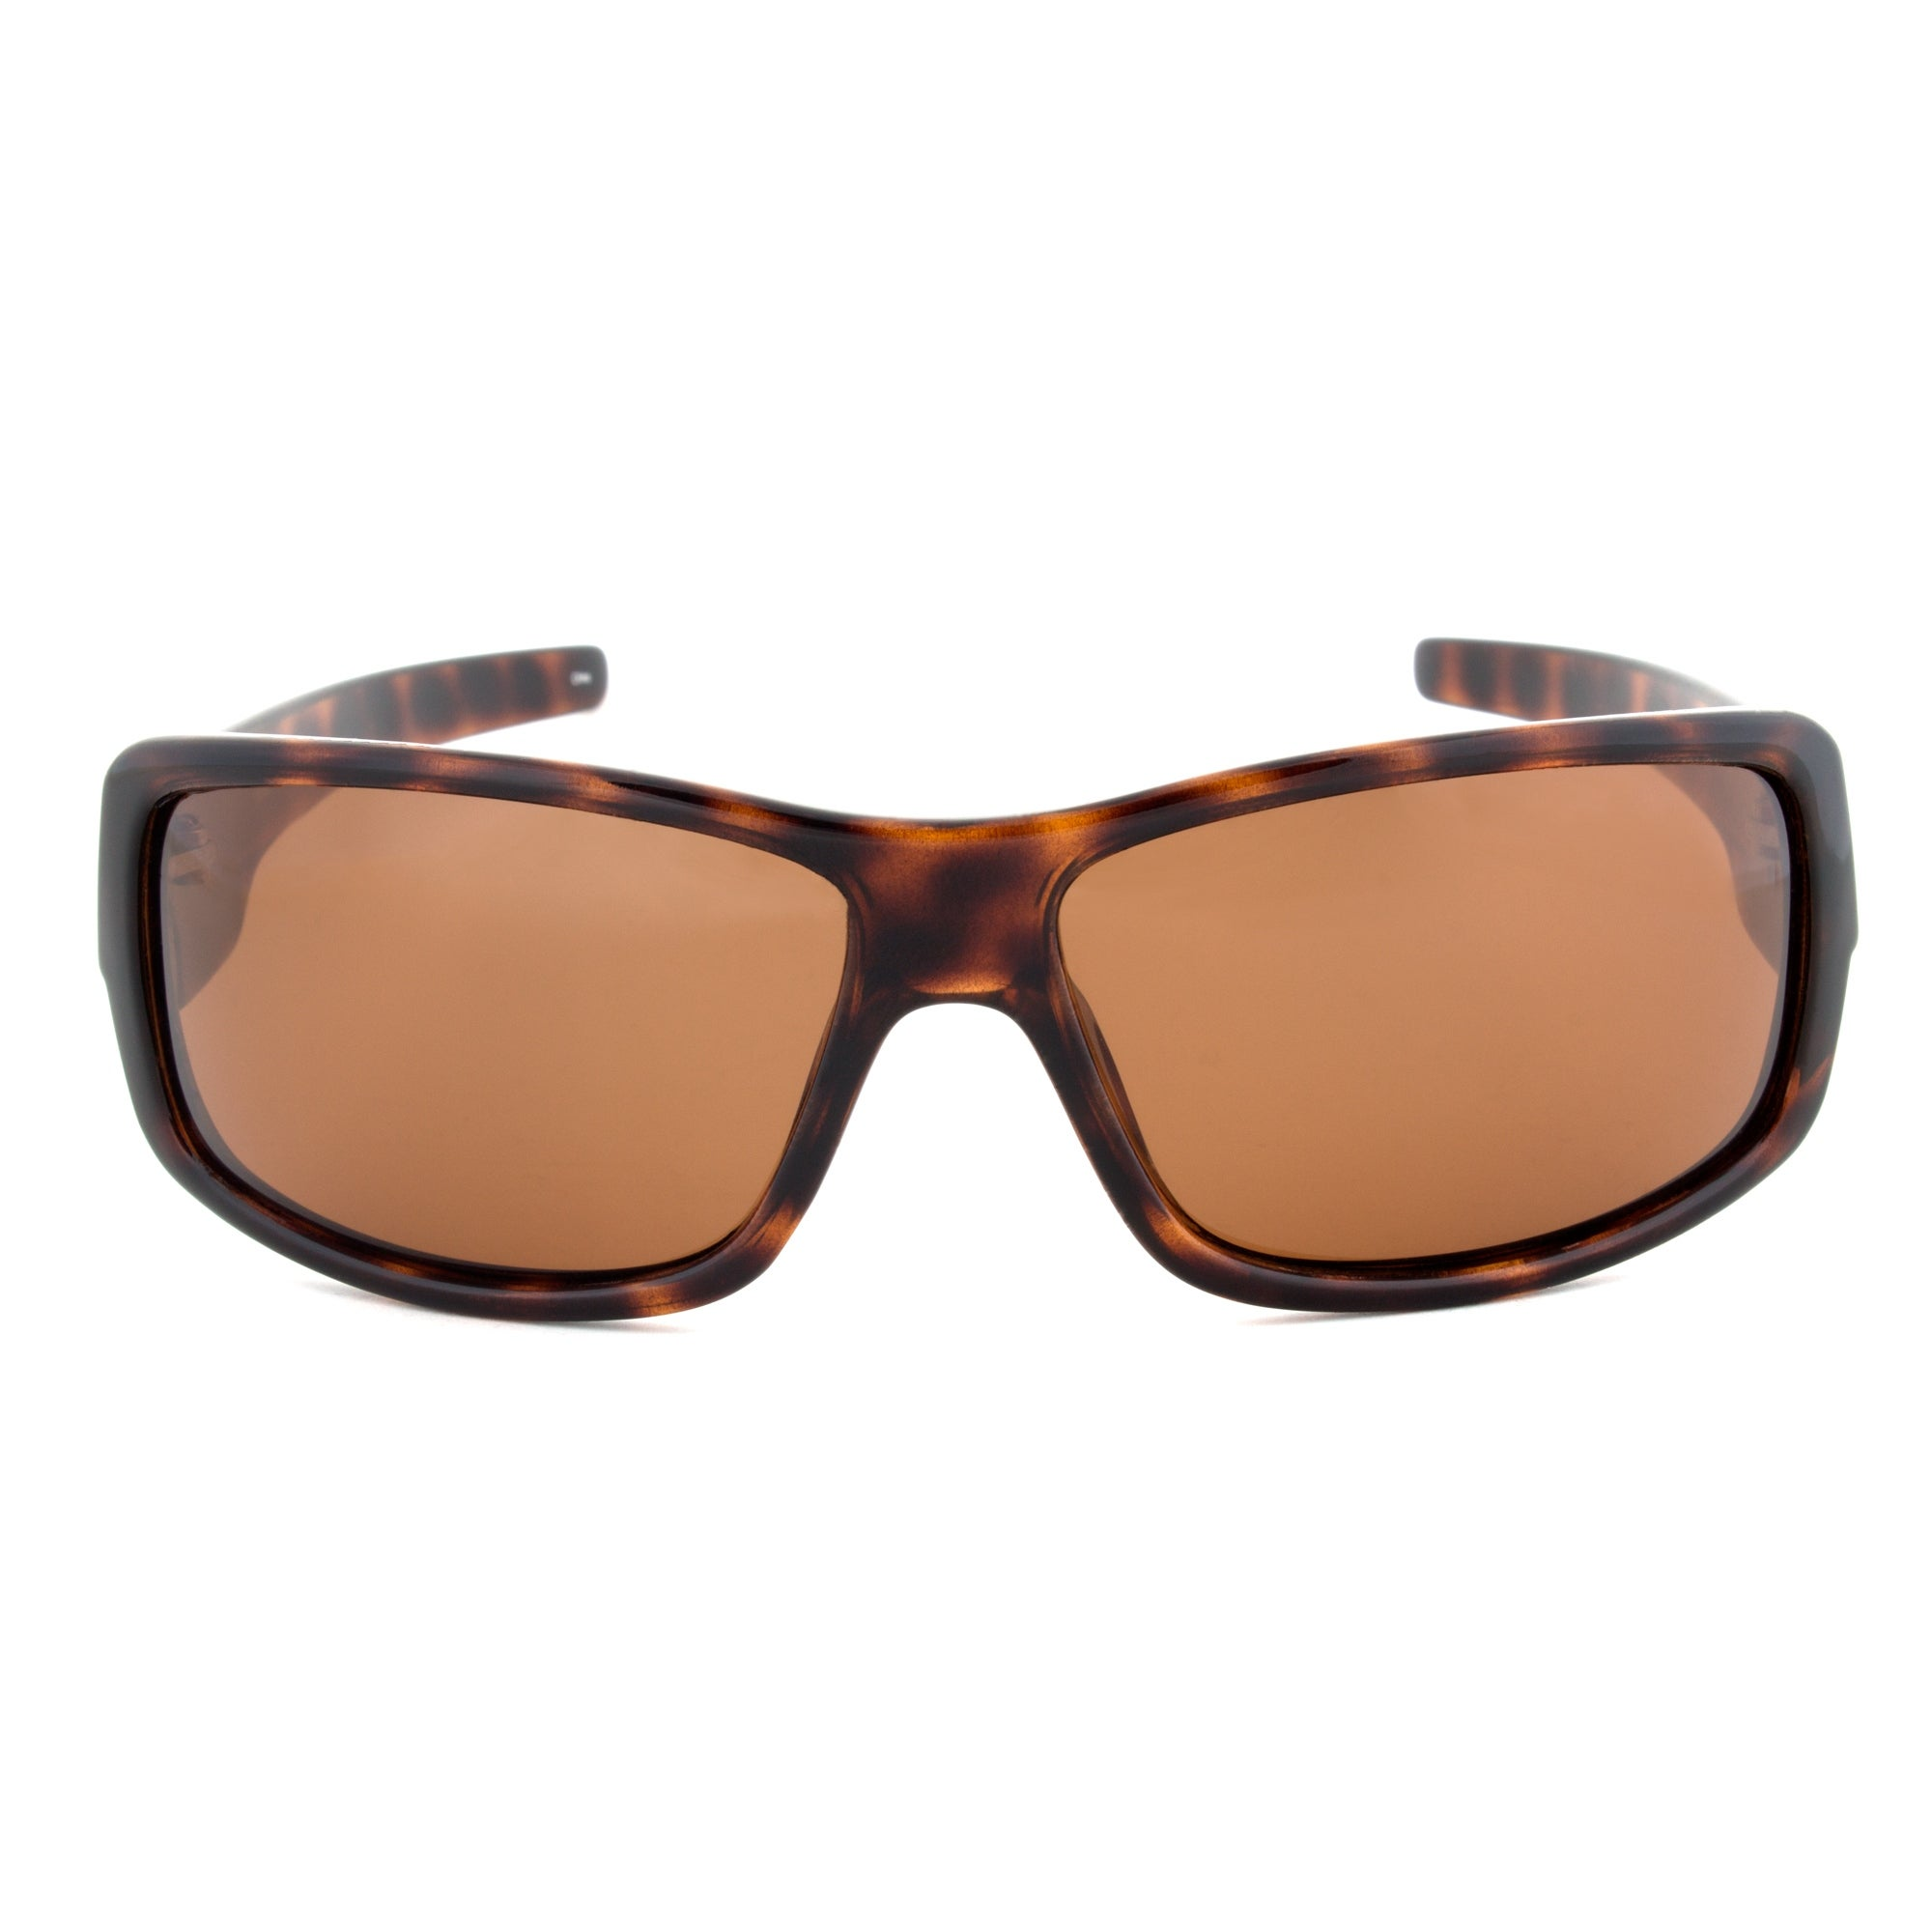 064aba7fa235 Shop Timberland TB7092 52H Rectangular Sunglasses - Free Shipping ...